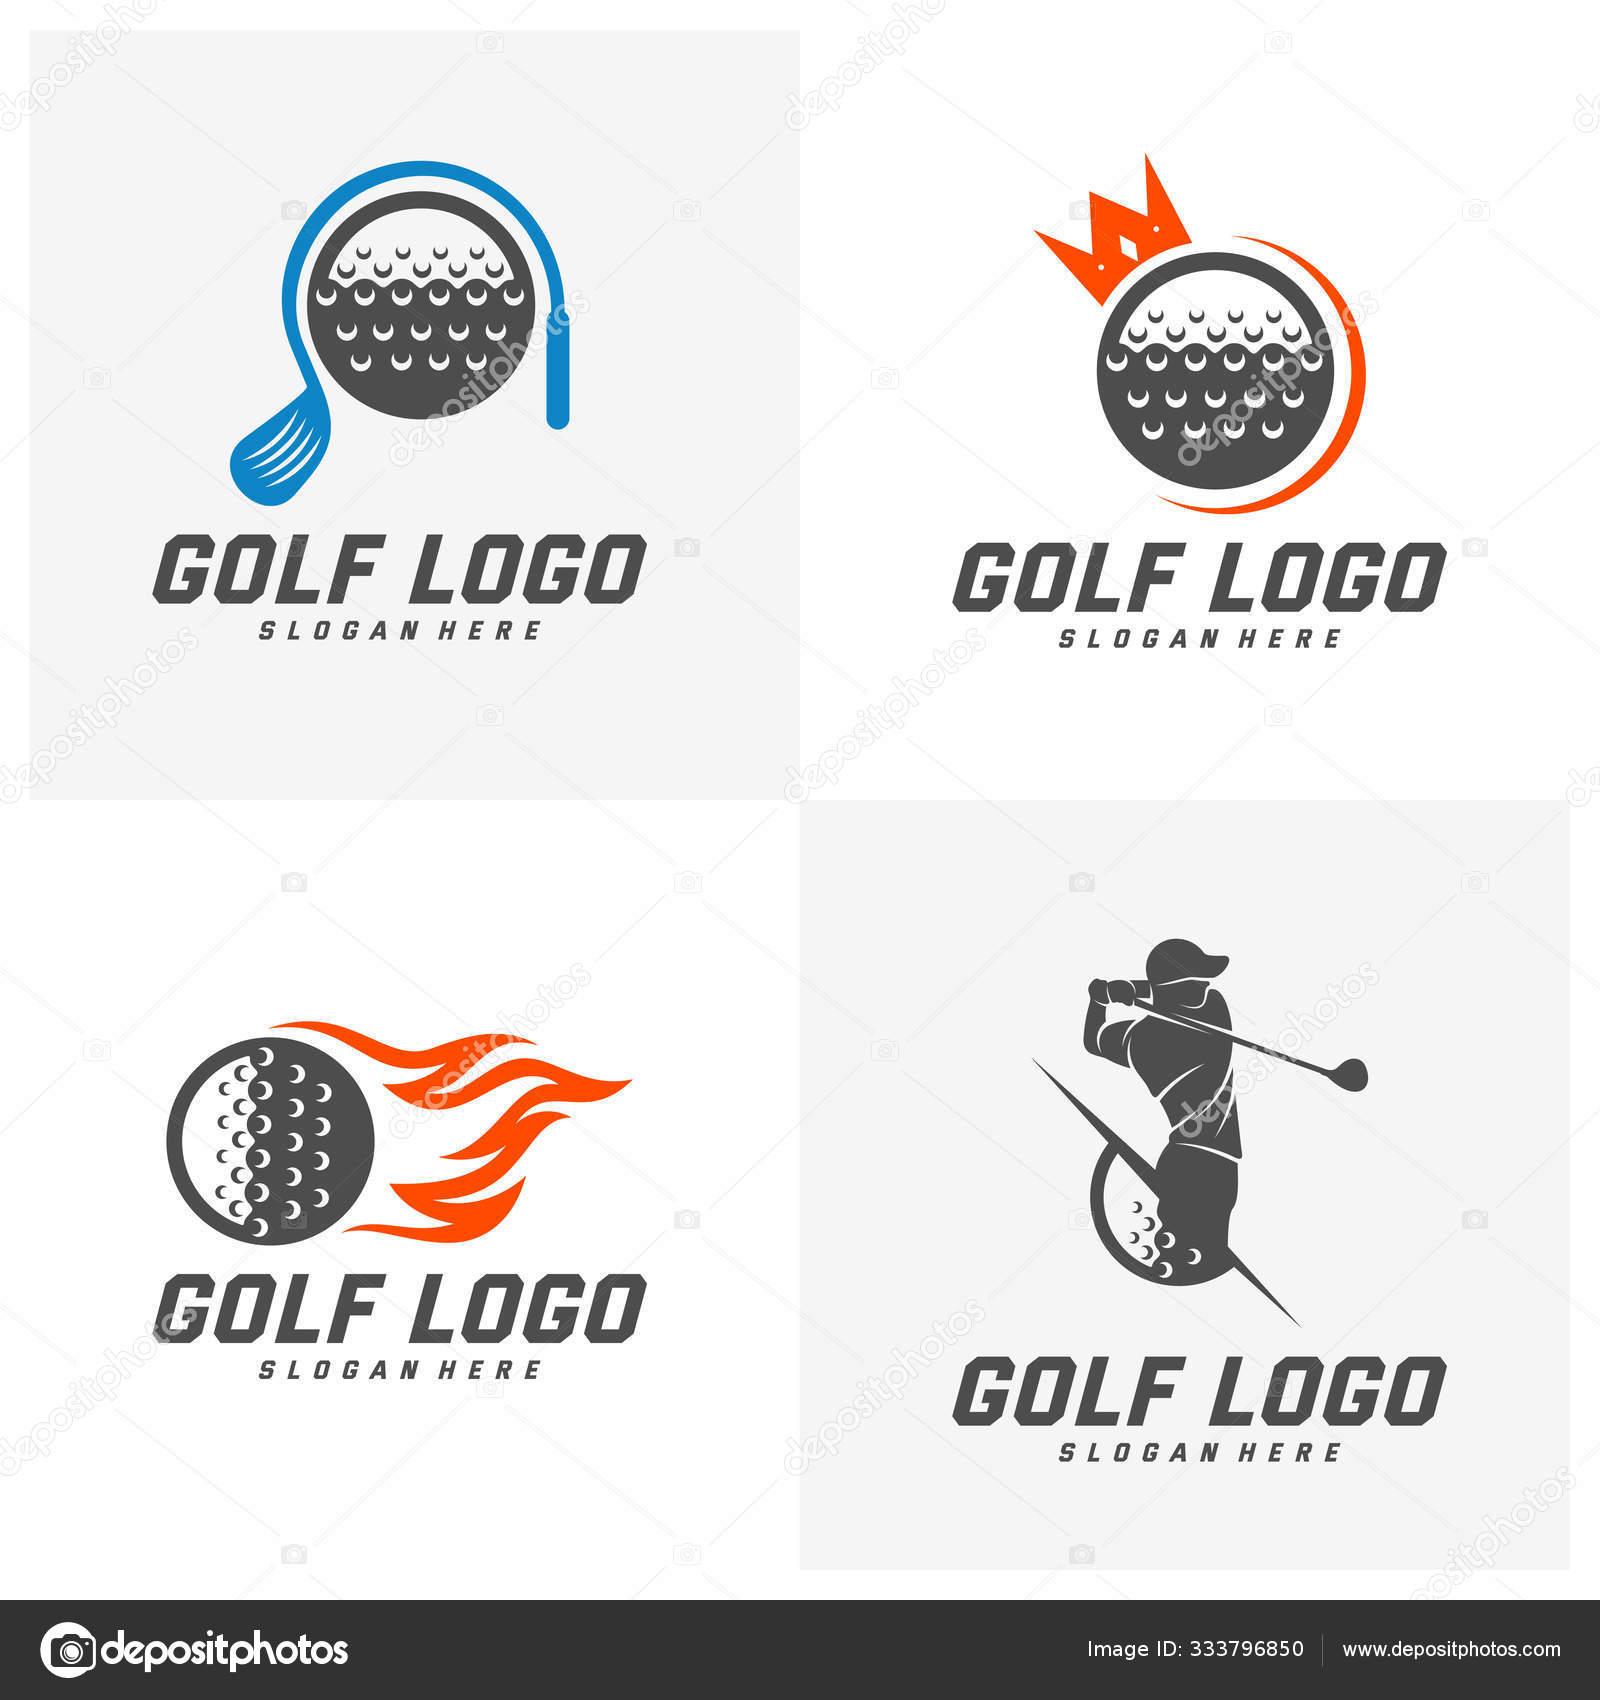 Set Of Golf Logo Design Vector Template Vector Label Of Golf Logo Of Golf Championship Illustration Creative Icon Design Concept Stock Vector C Ssports 333796850